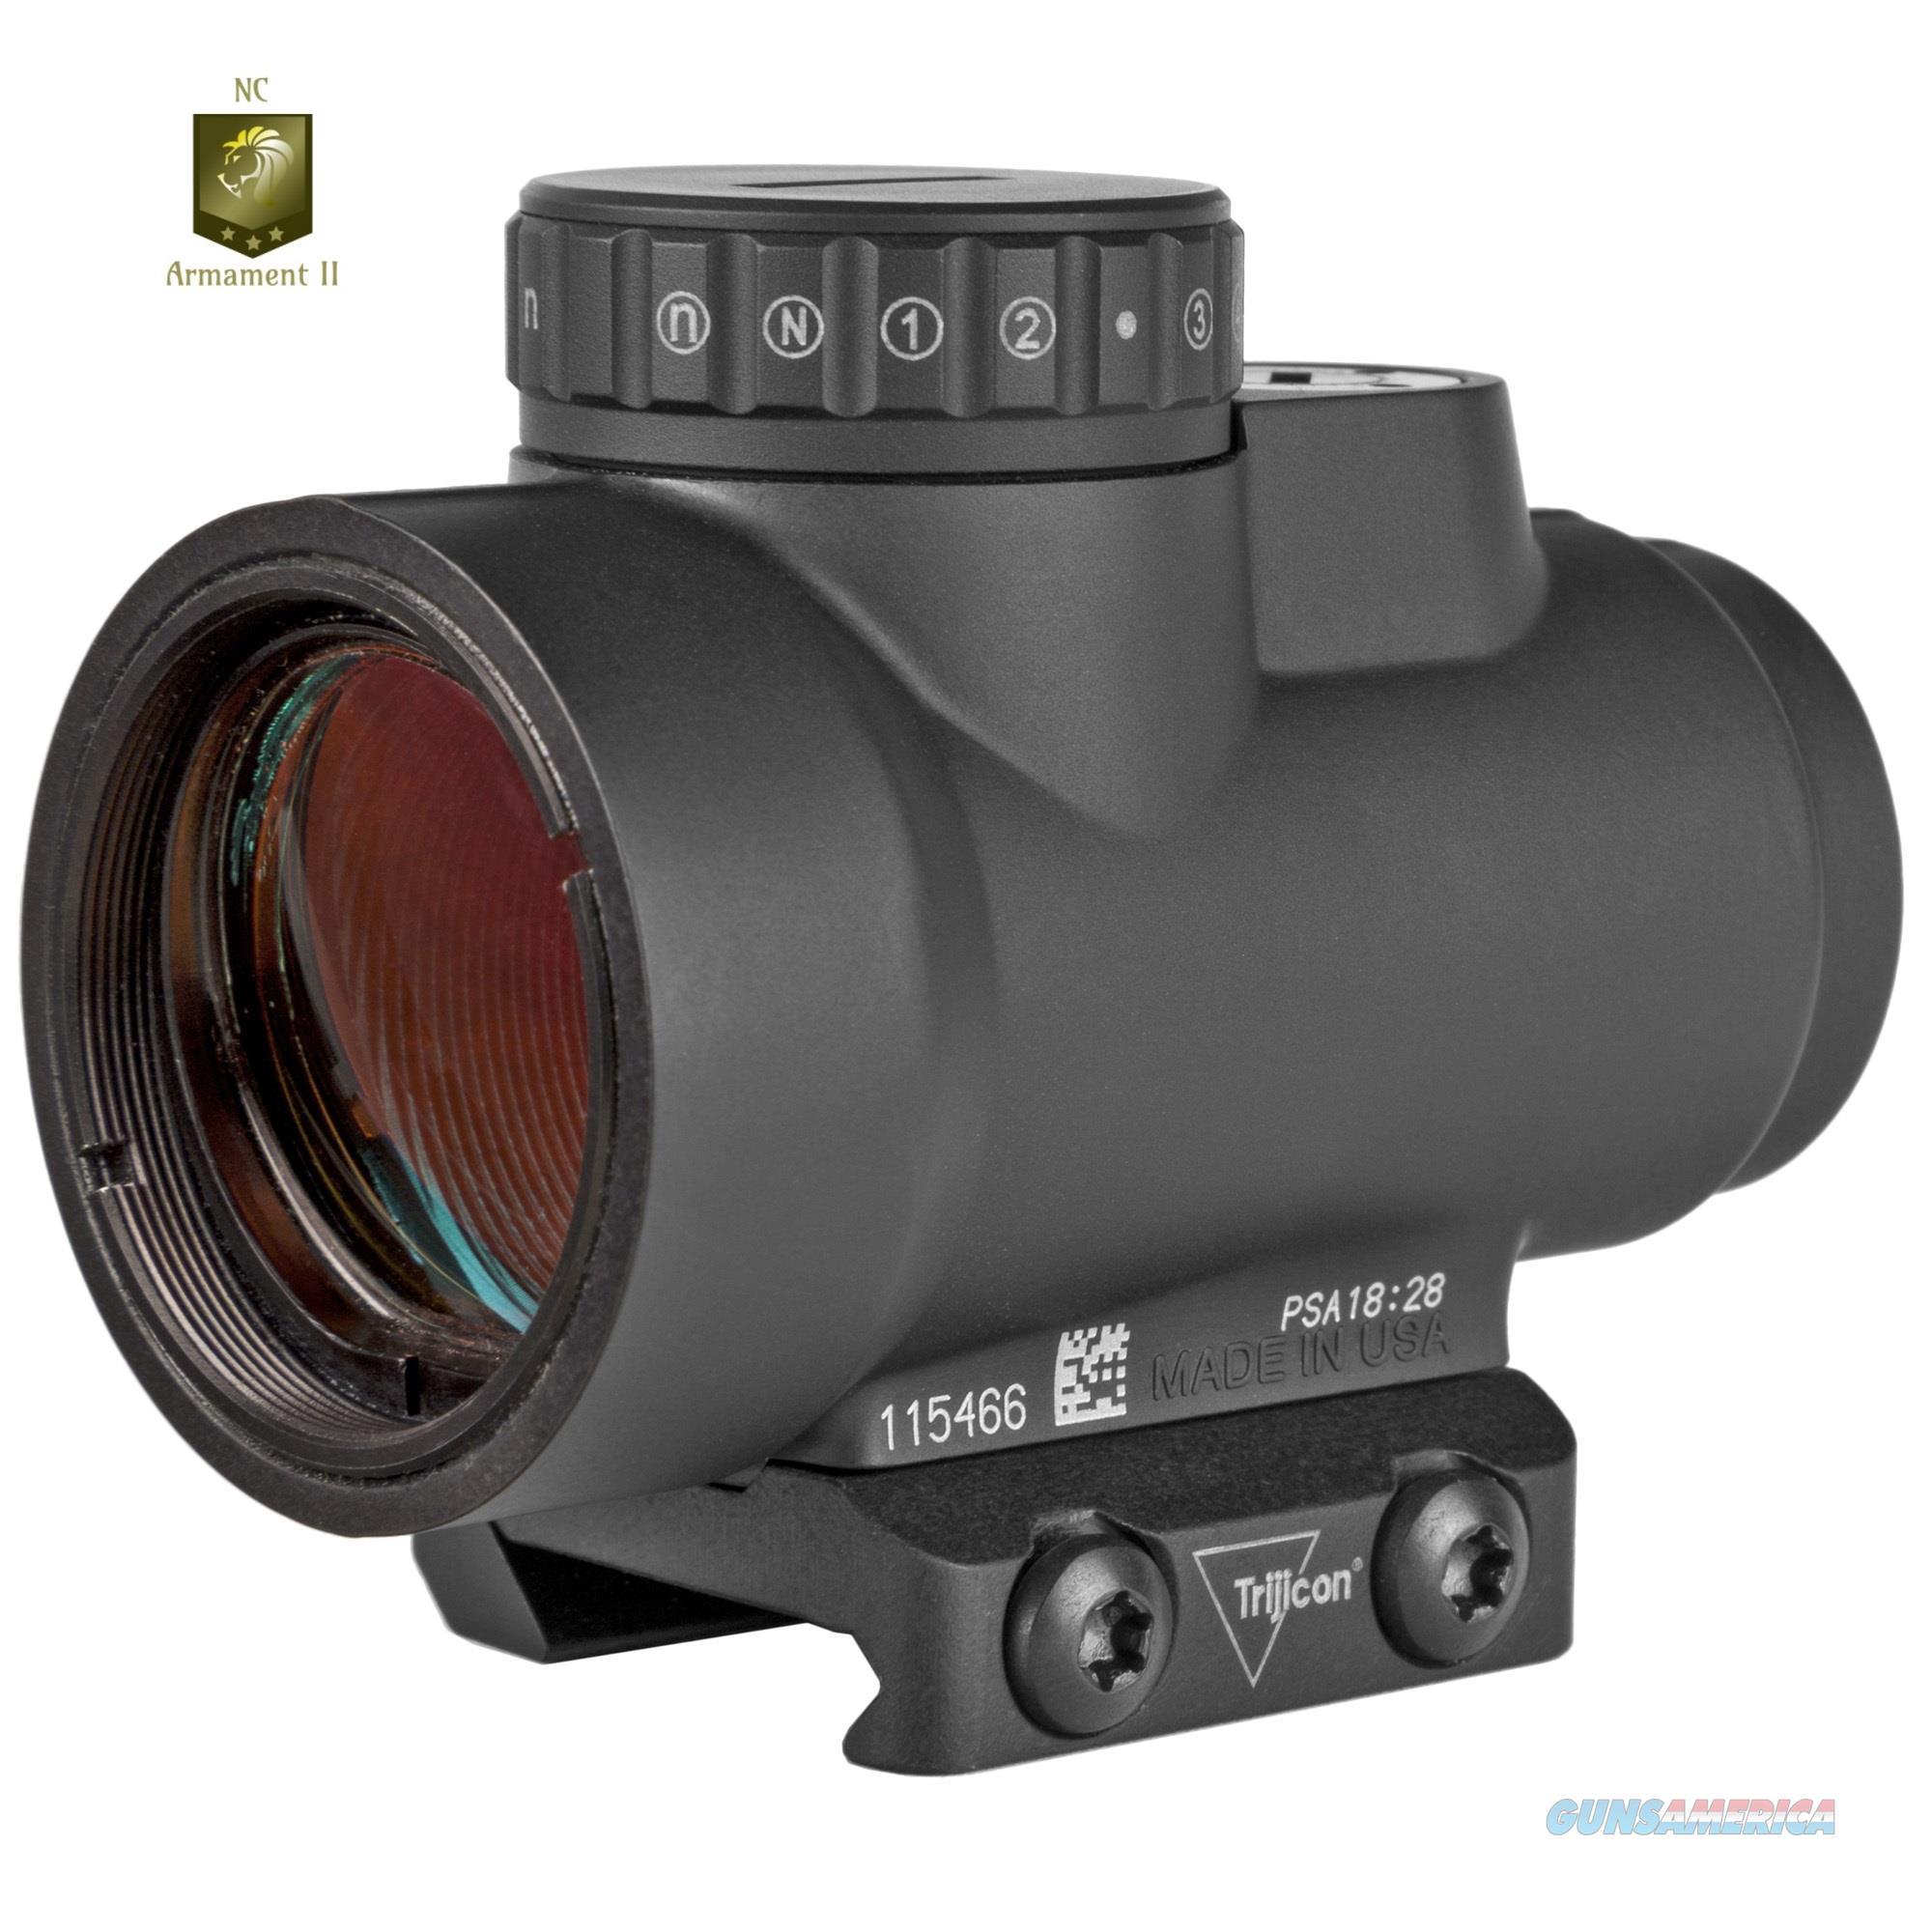 Trijicon MRO HD Red Dot 1X25 68MOA Circle With 2MOA Center Dot Low Mount  Non-Guns > Scopes/Mounts/Rings & Optics > Tactical Scopes > Red Dot